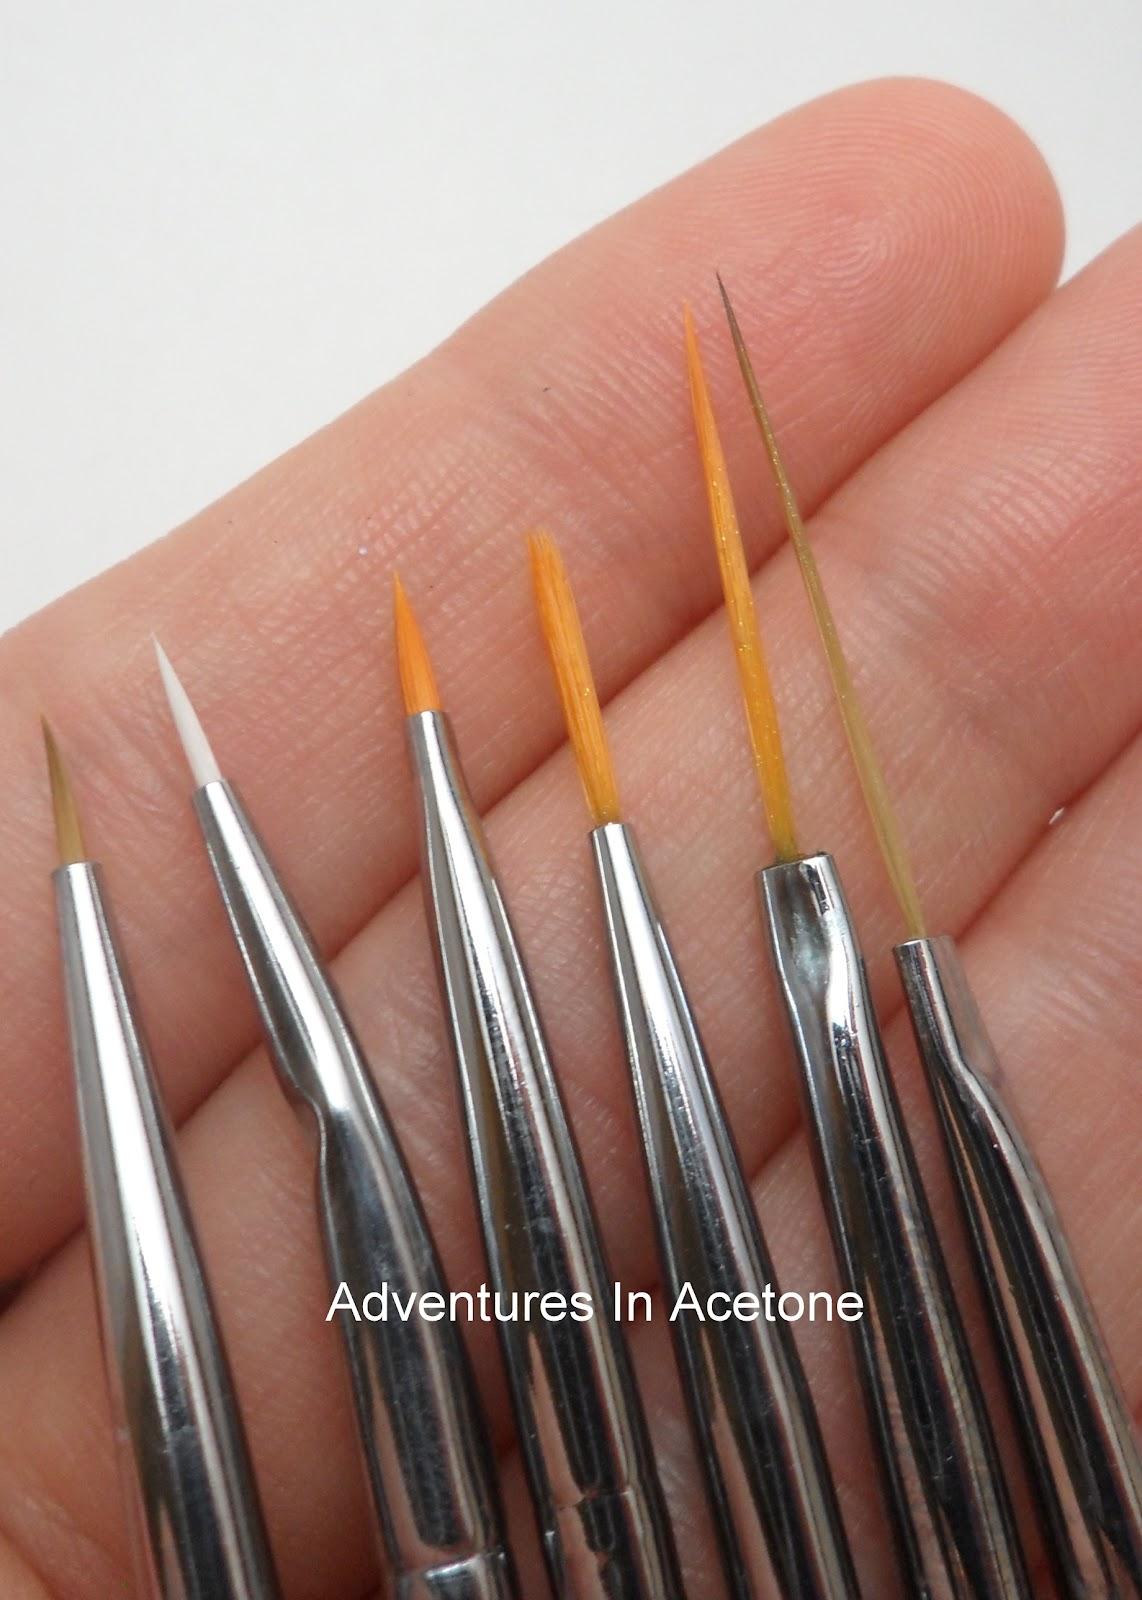 MASH Nail Art Brush Set Review! - Adventures In Acetone